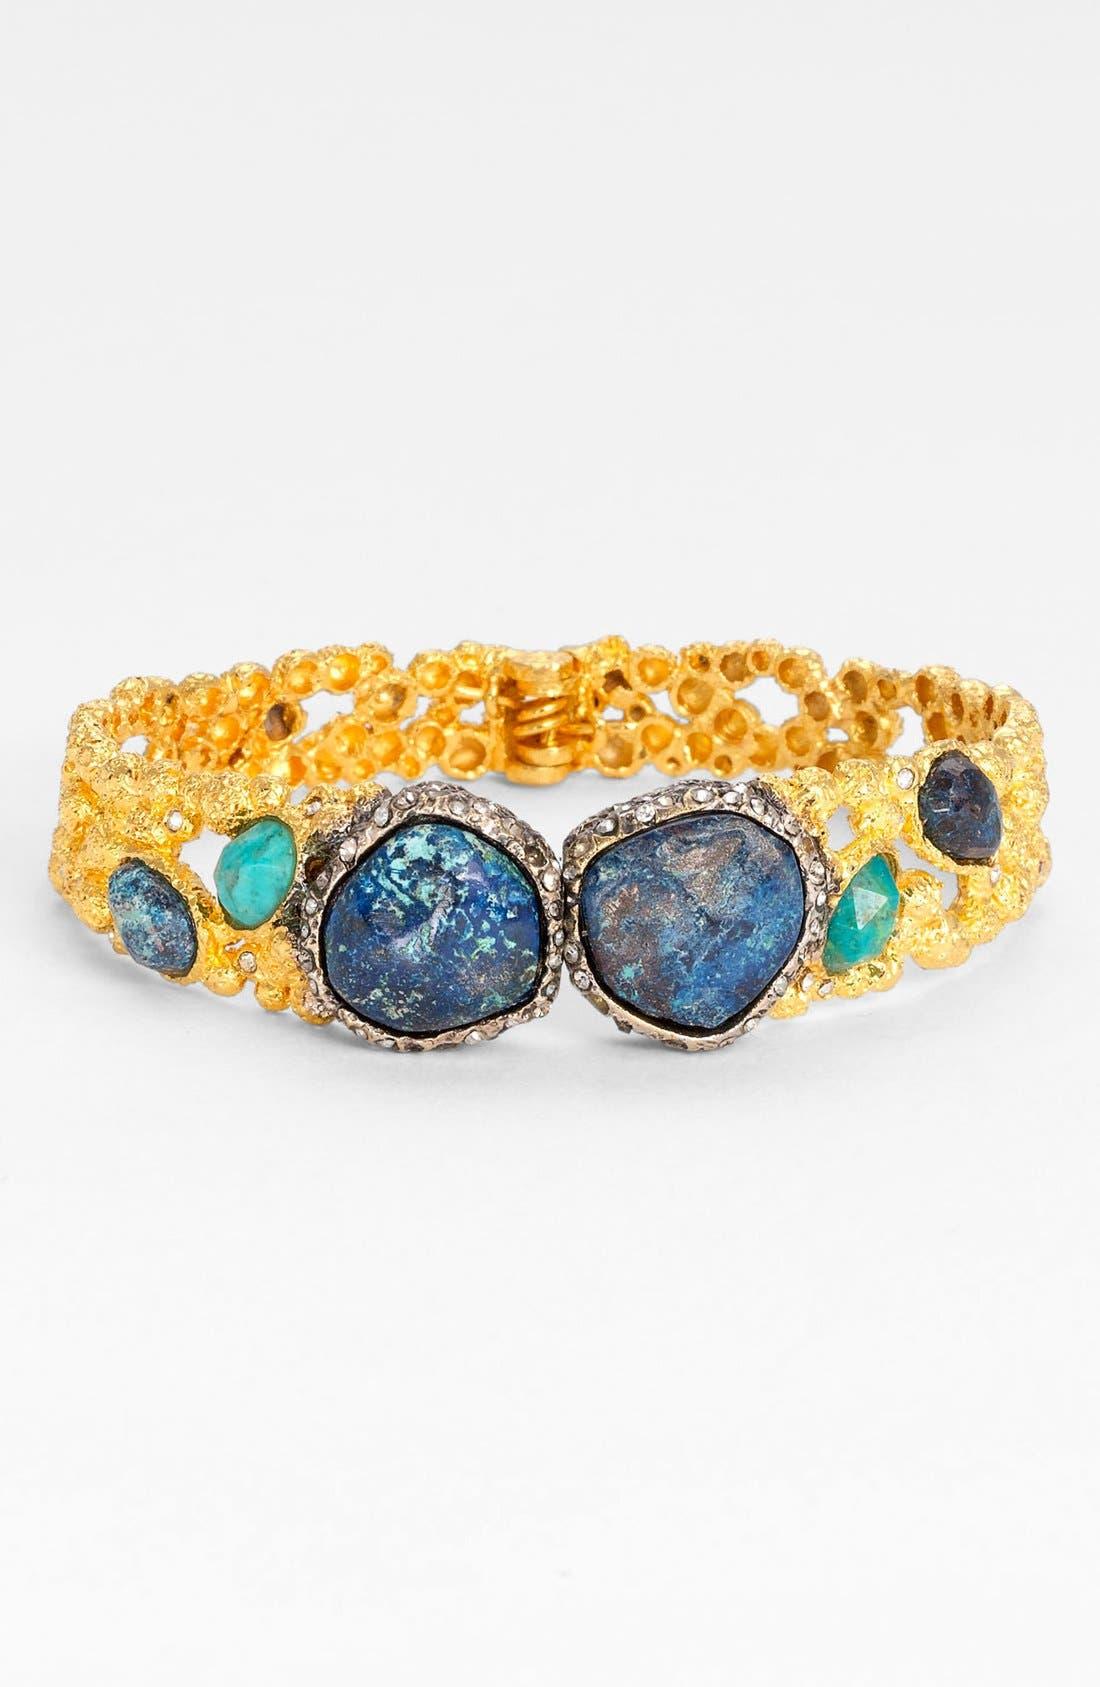 Alternate Image 1 Selected - Alexis Bittar 'Elements - Cordova' Chrysocolla Encrusted Hinged Bracelet